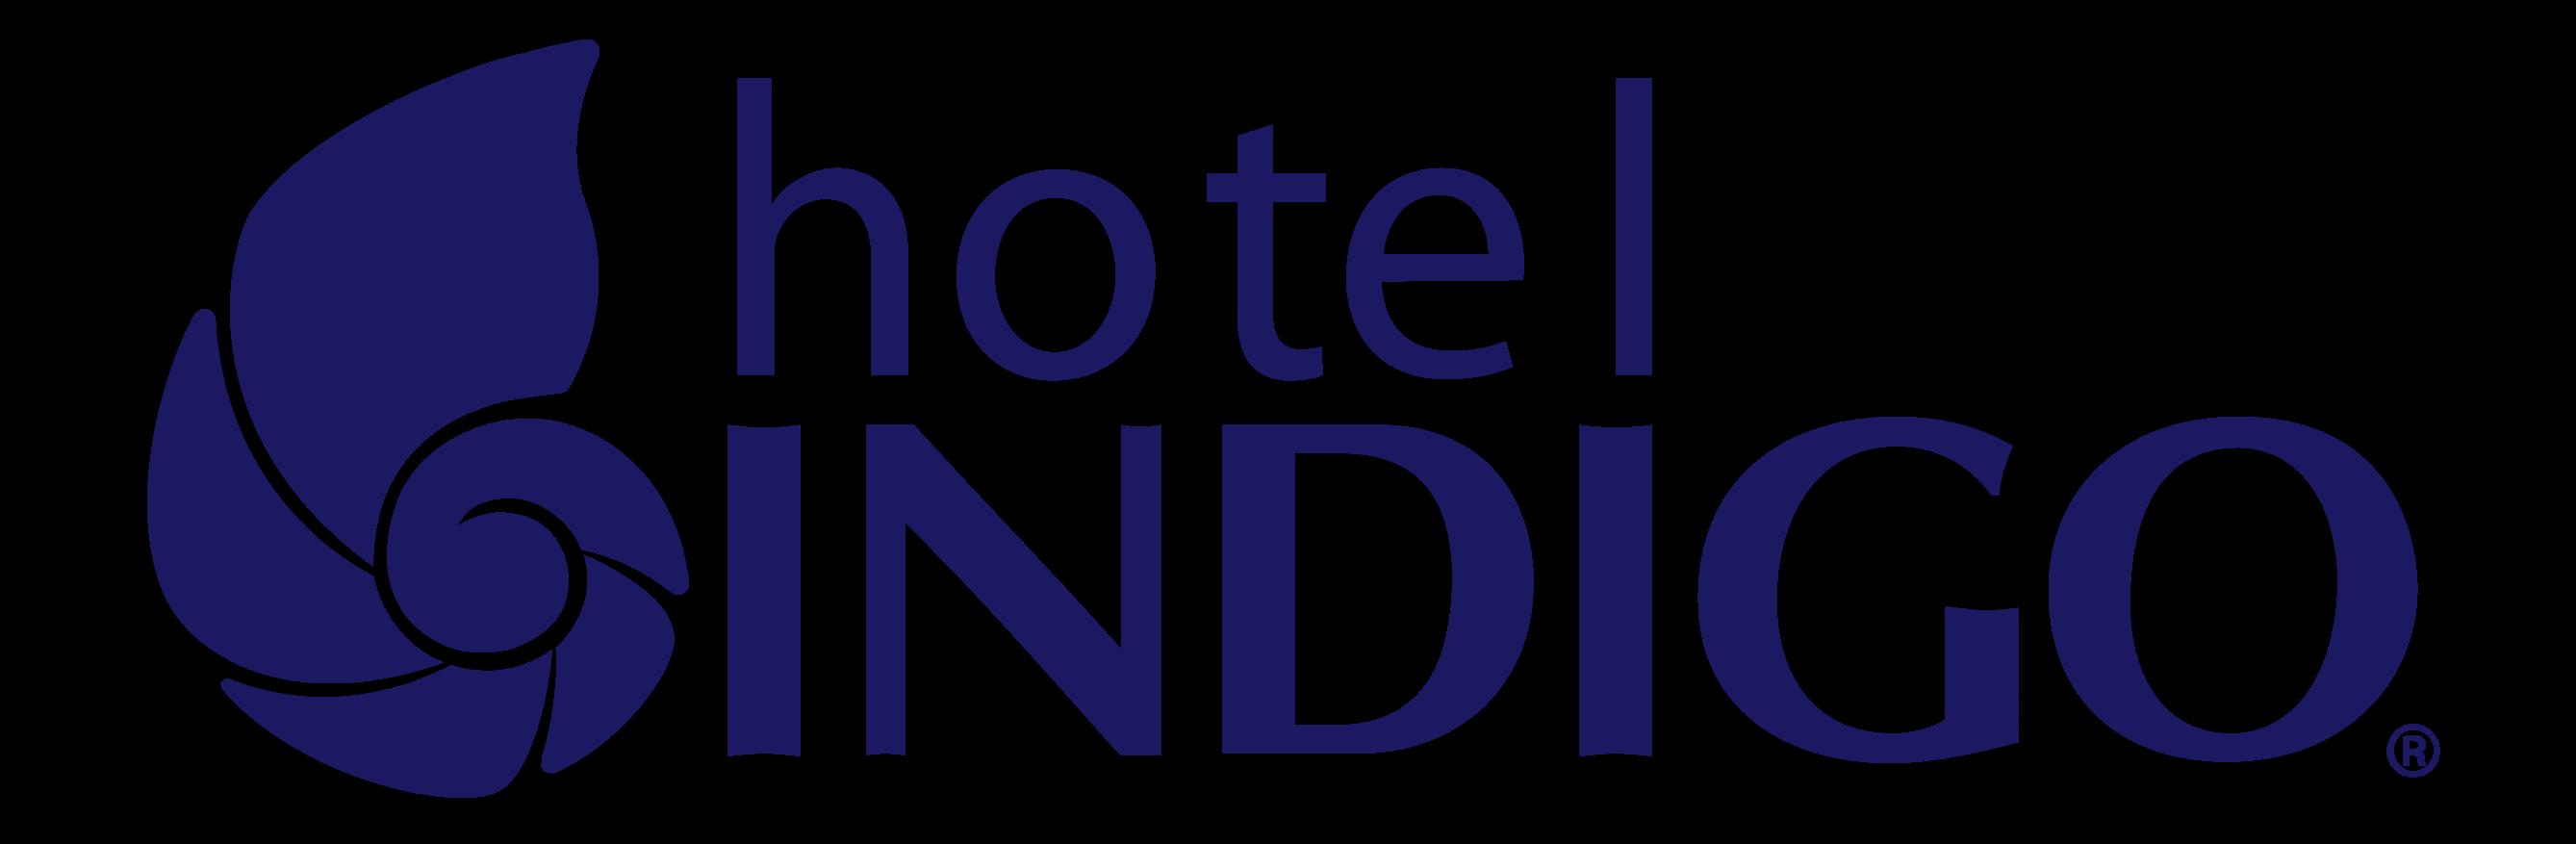 hotel indigo � logos download